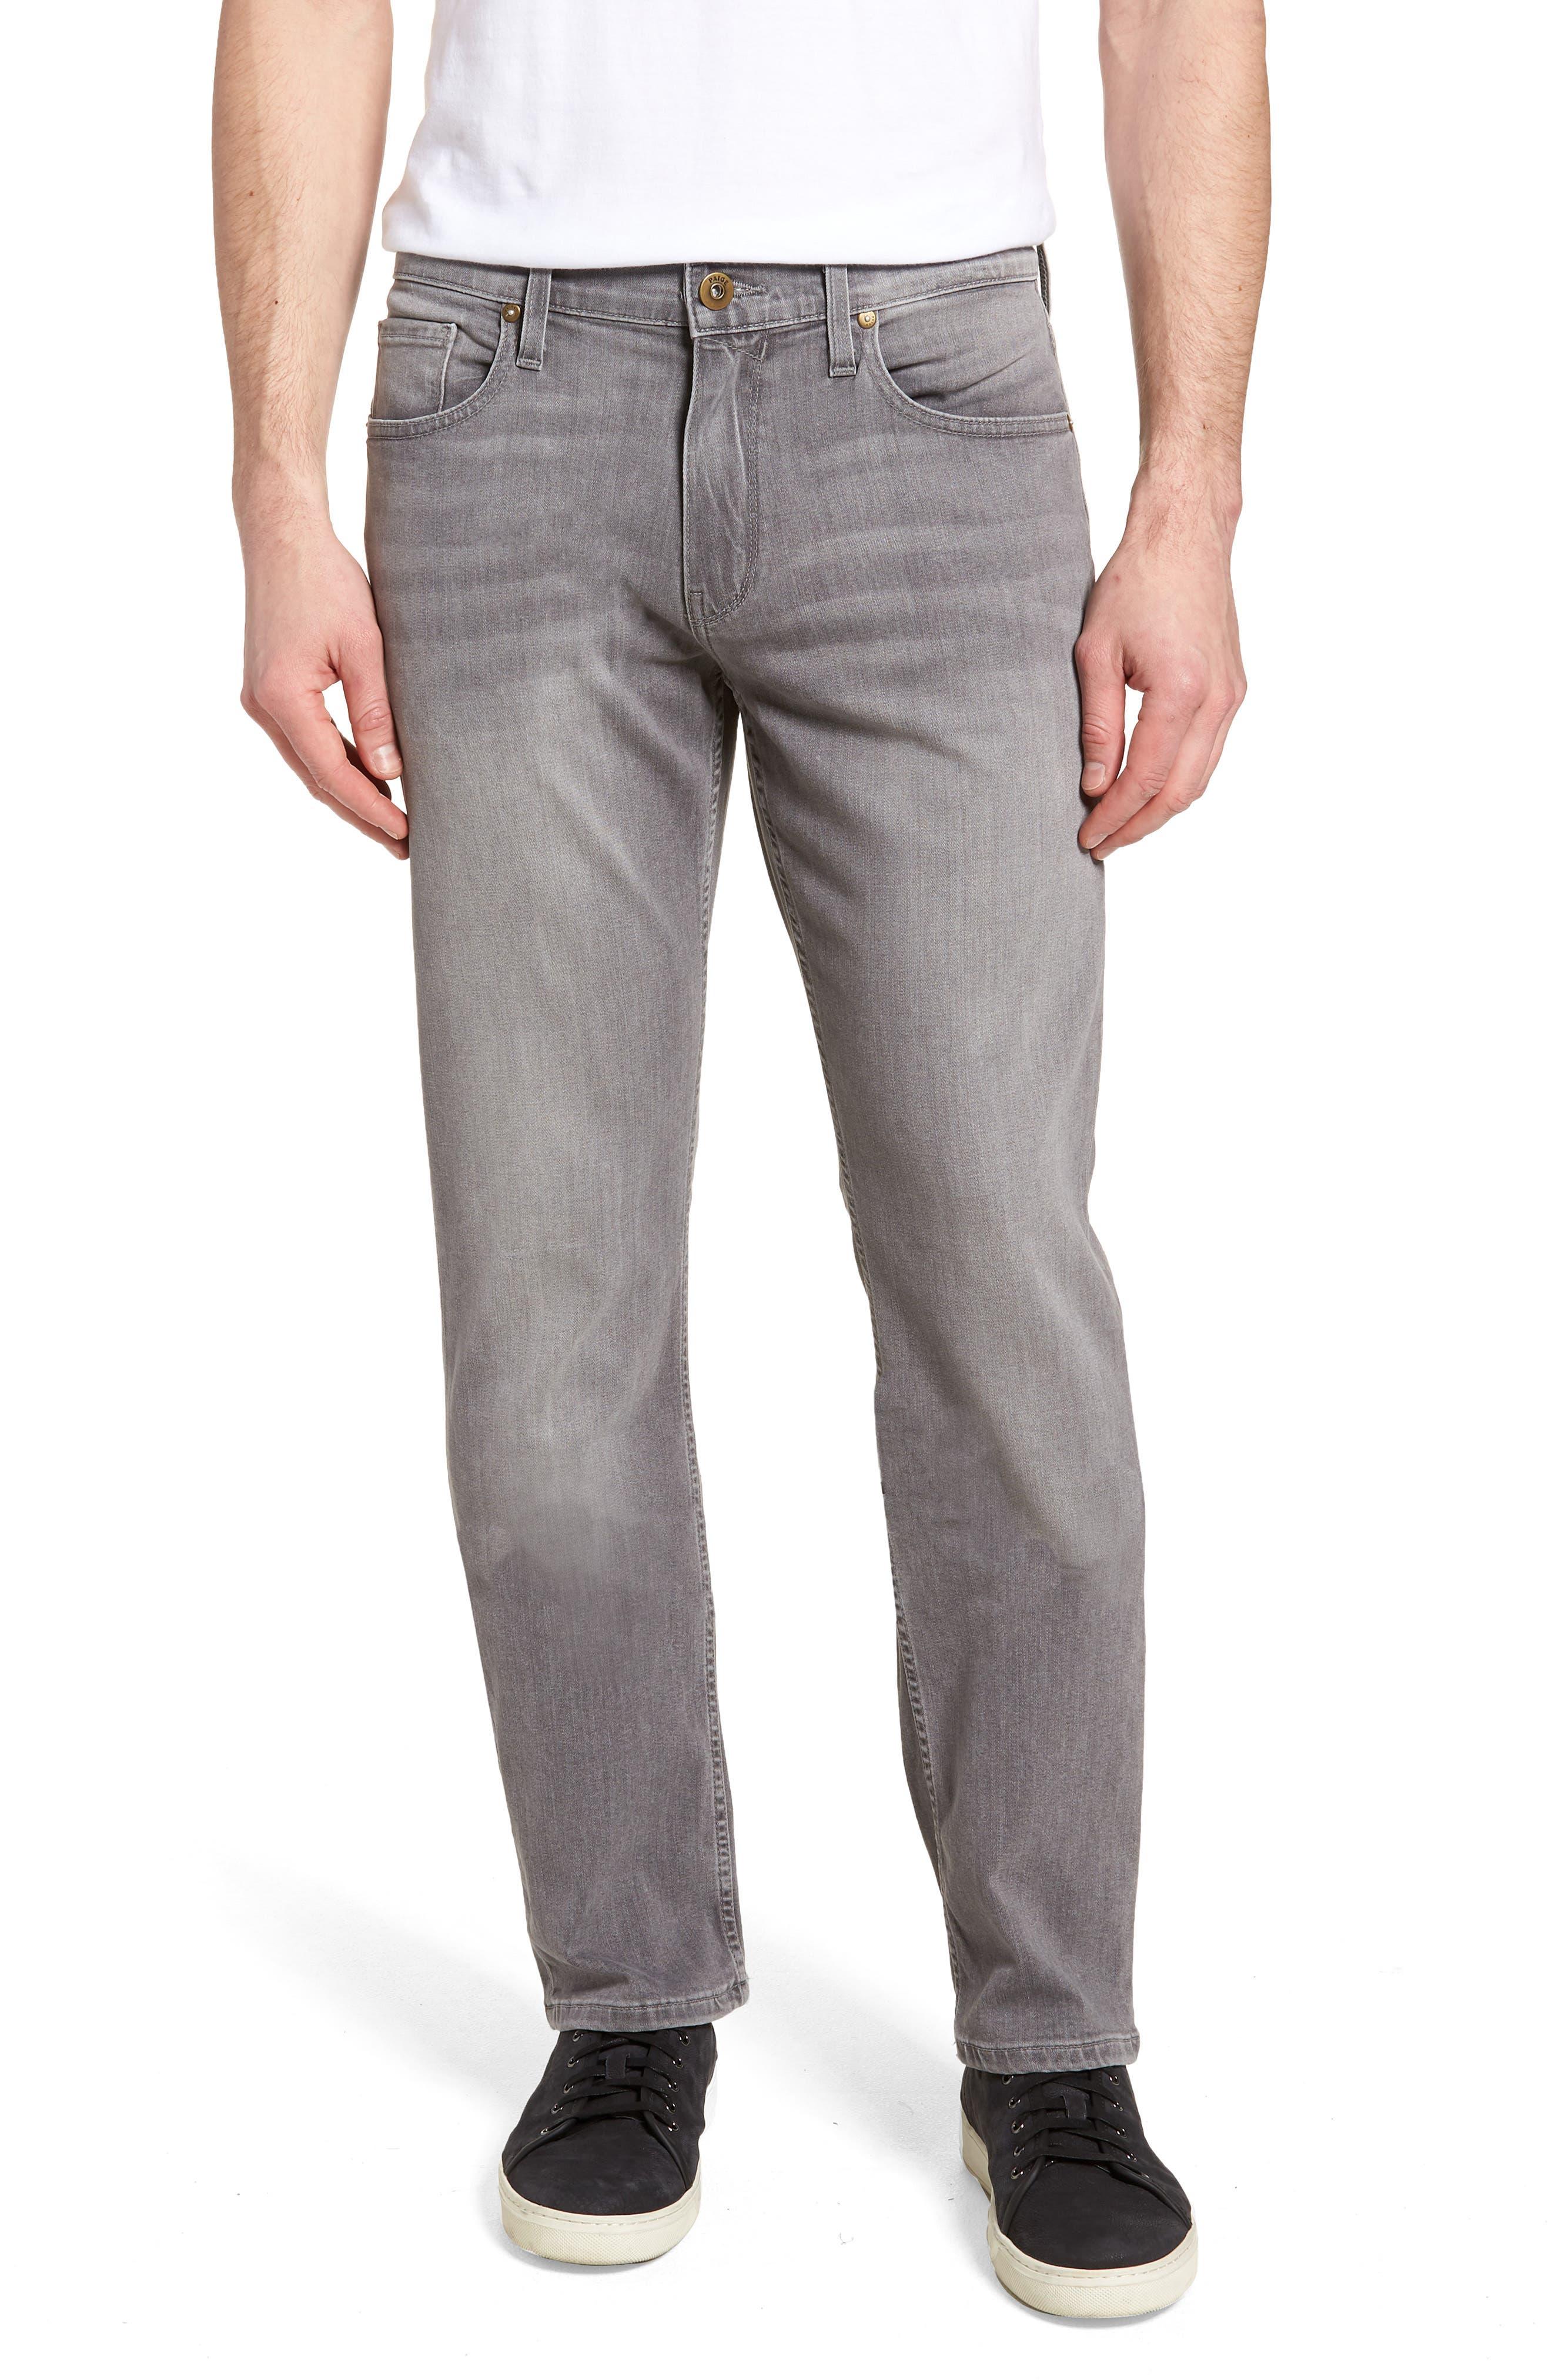 PAIGE Normandie Straight Leg Jeans (Annex)